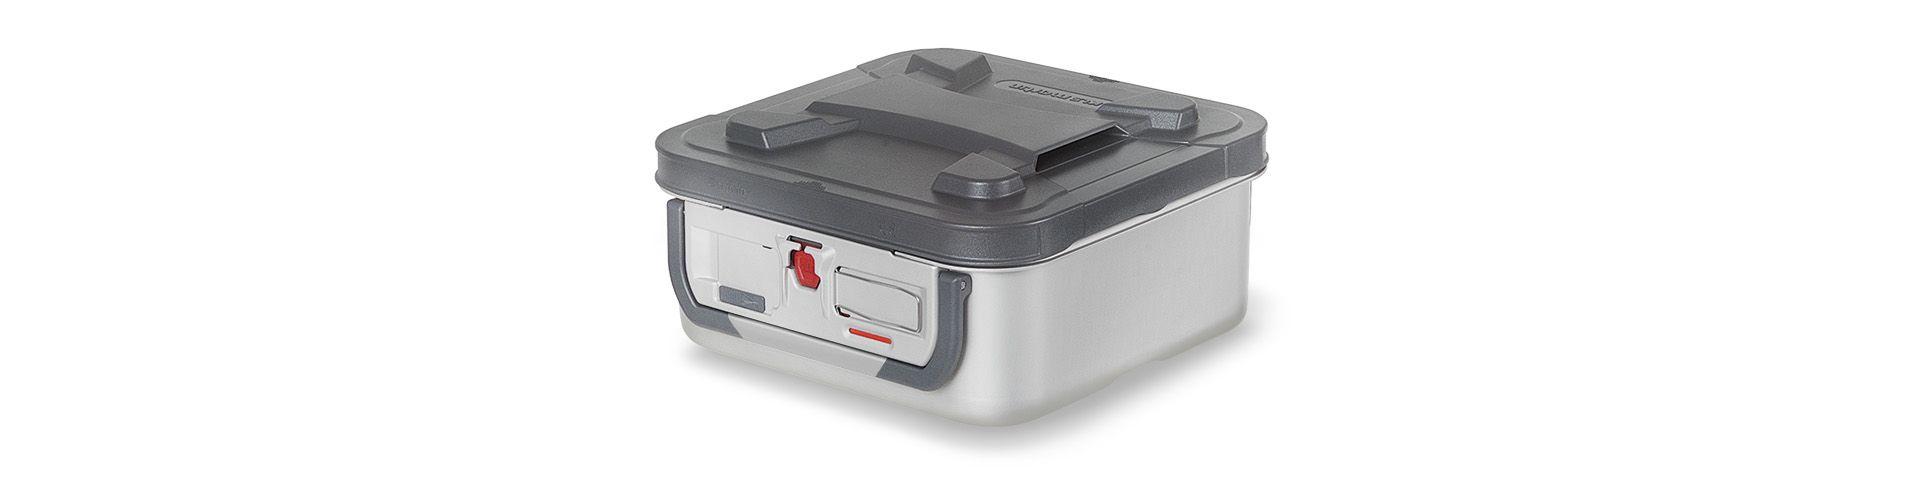 Sterilization container - system microStop